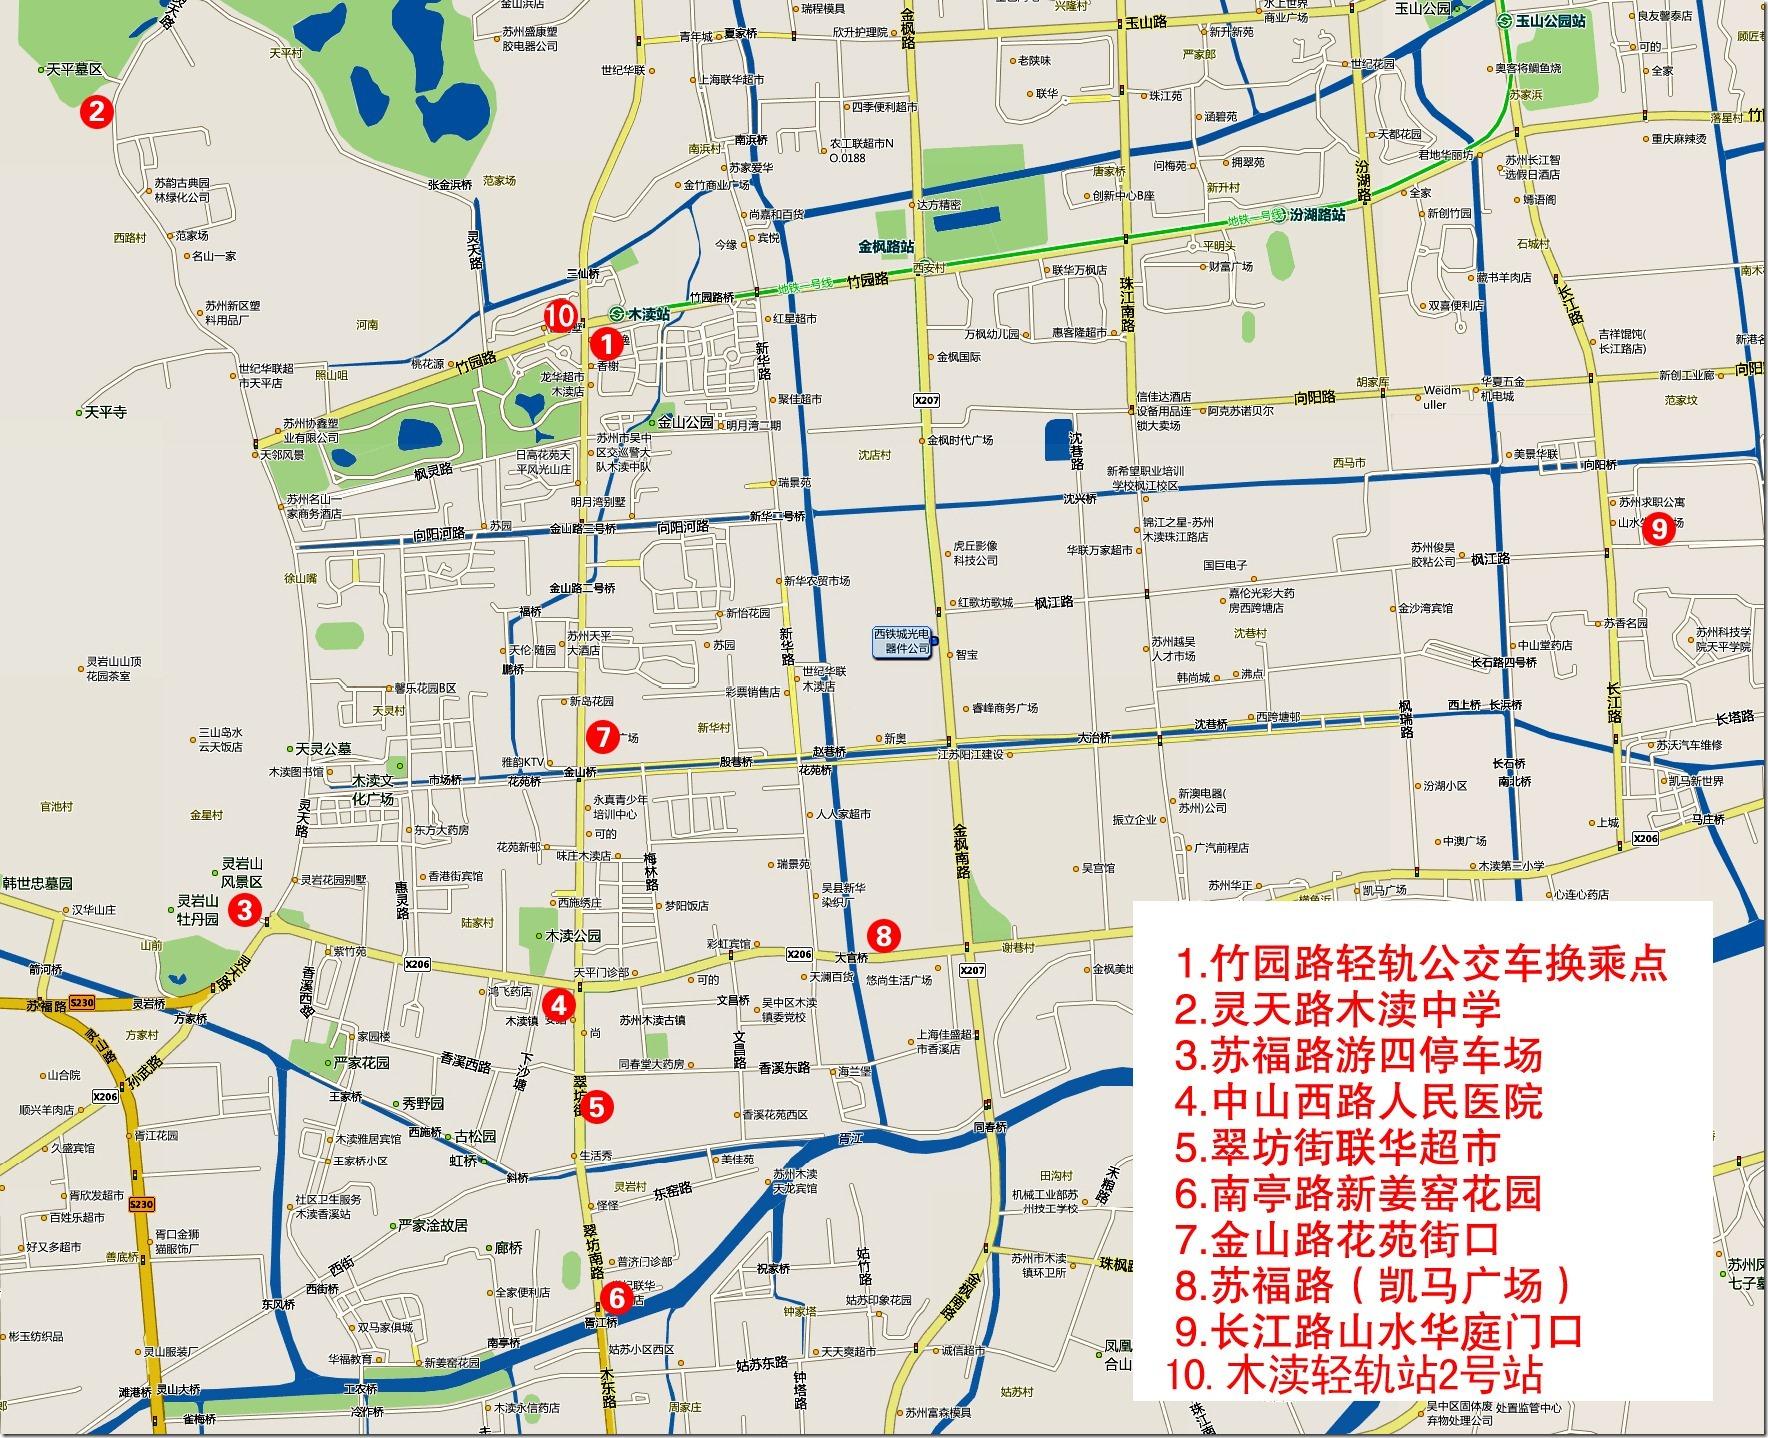 bicycle location mudu 1